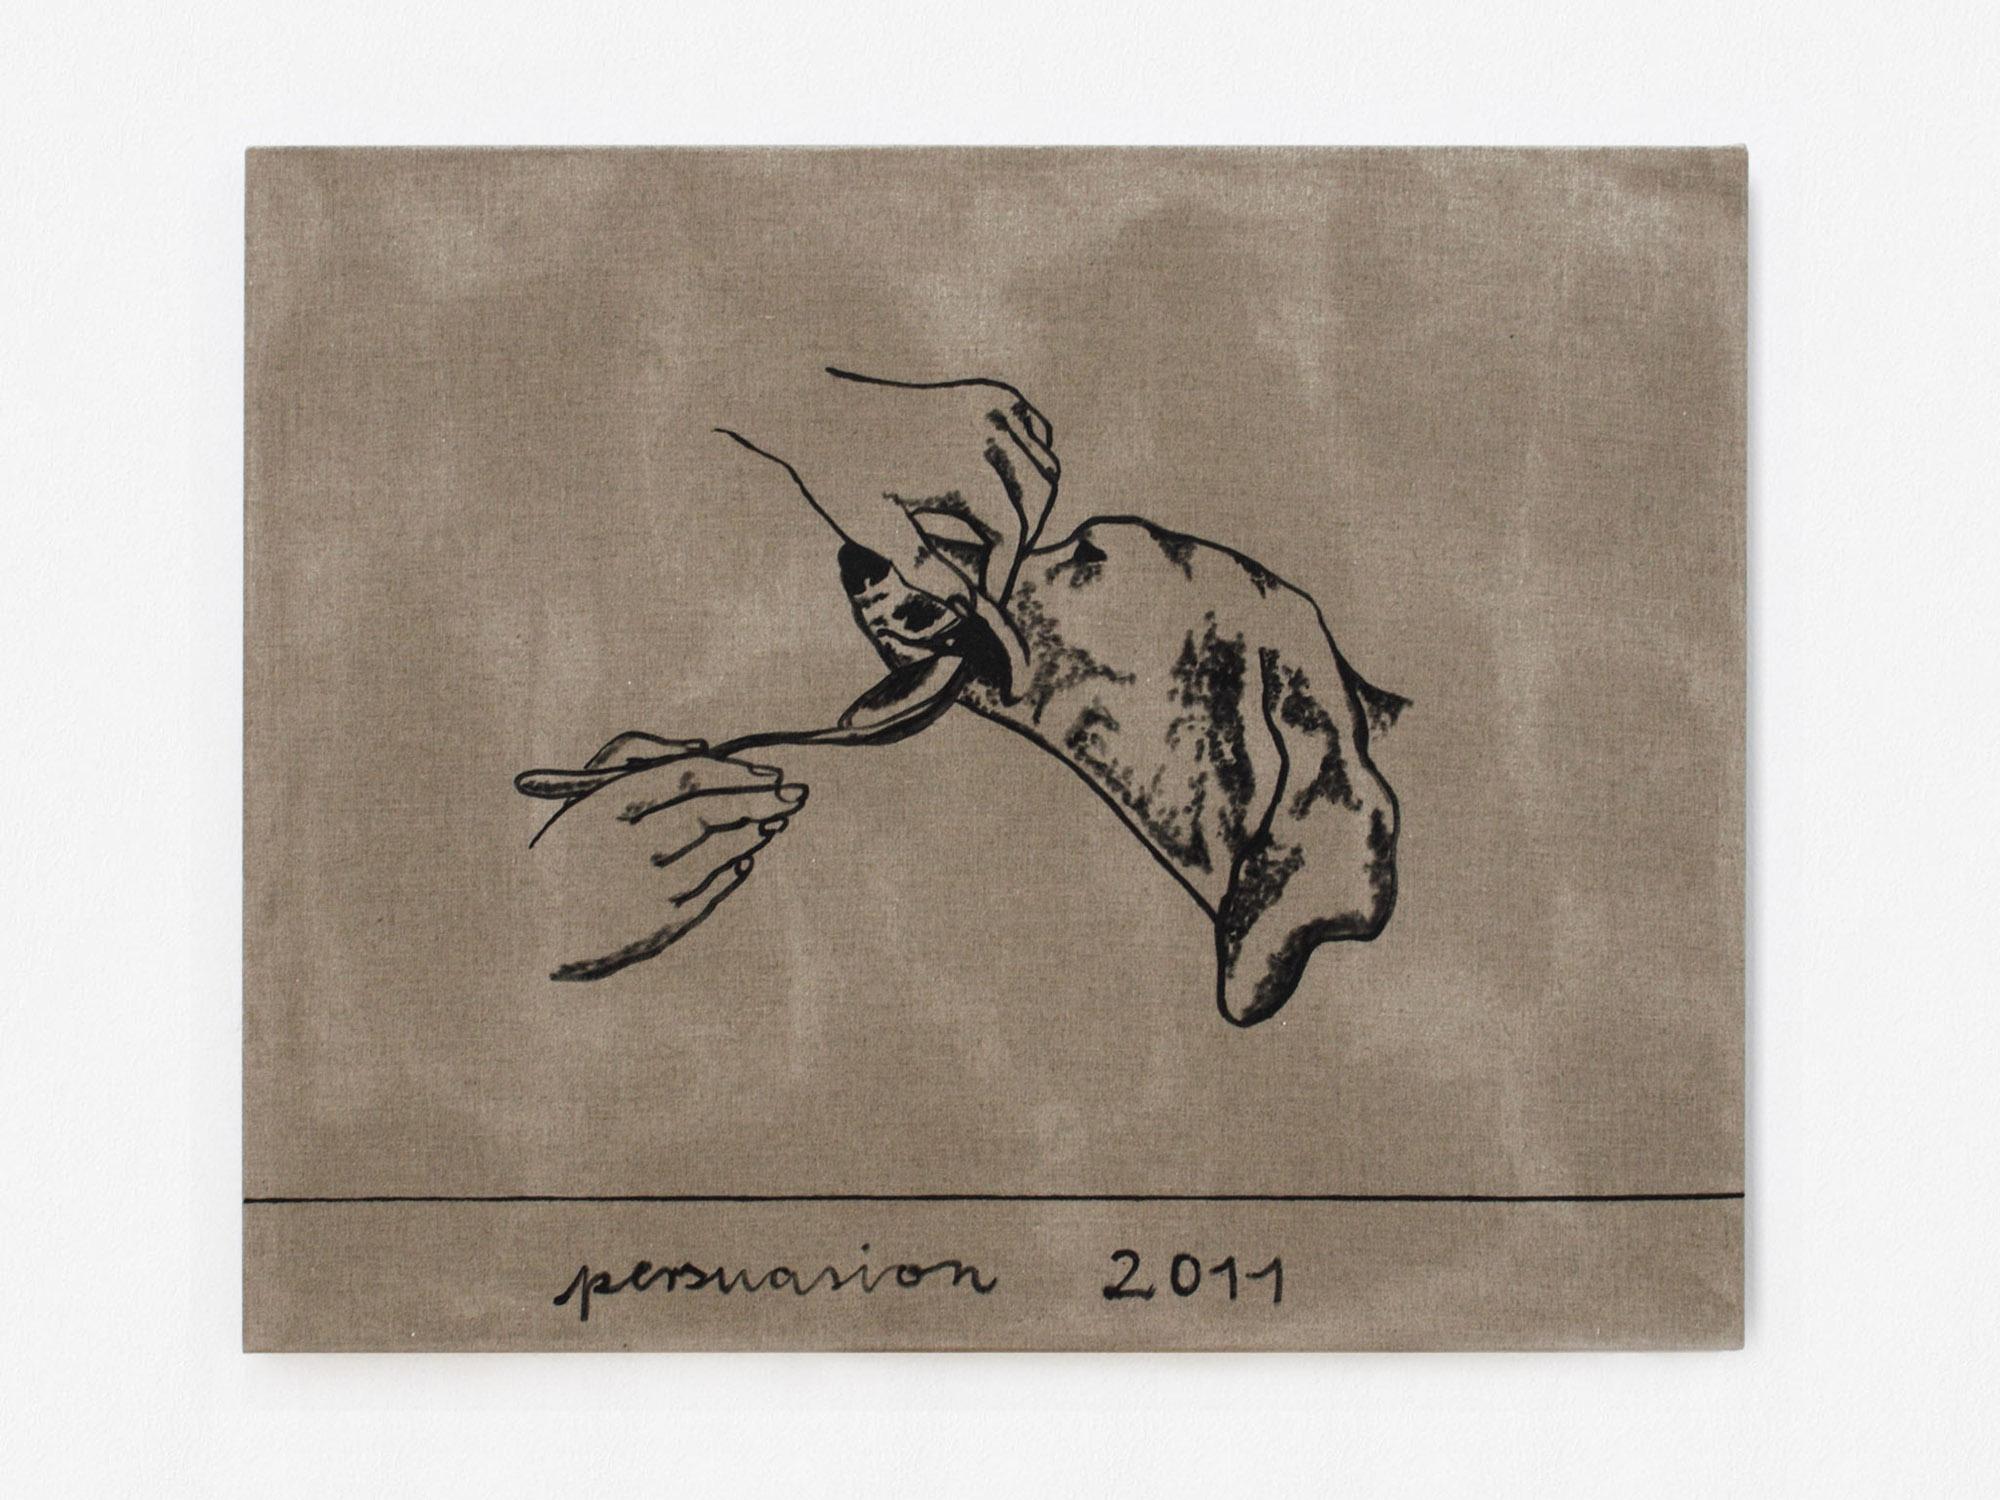 Marcus Kleinfeld, PERSUASION, 2011 Oil on linen 80 x 110 cm